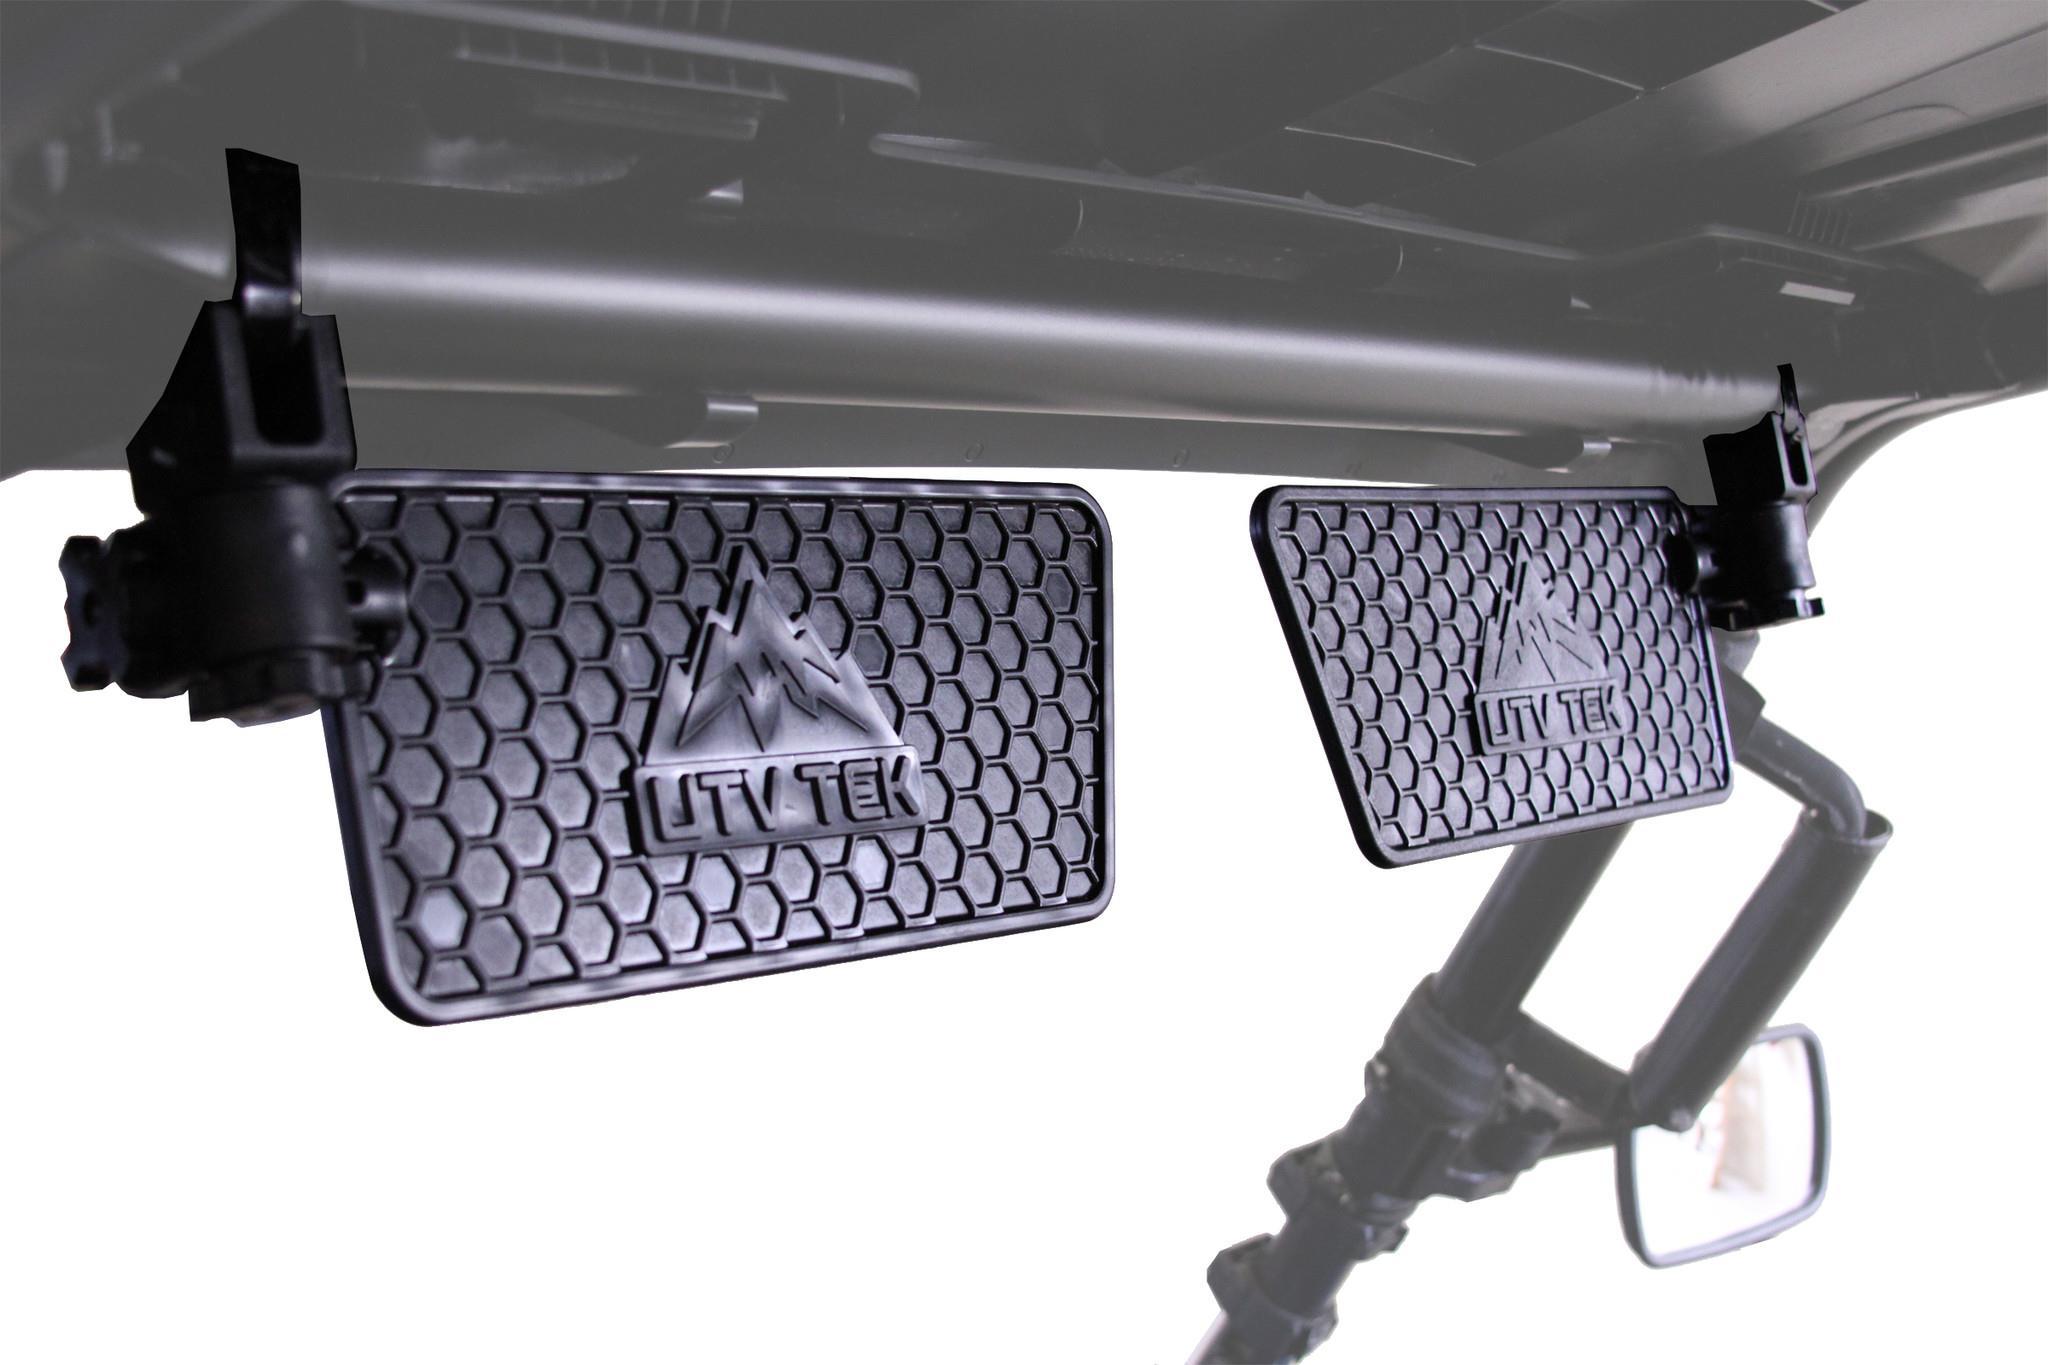 Atv Tek Utvsv1 Sun Visor Pyle Plam40 4gauge Amplifier Installation Kit Walmartcom